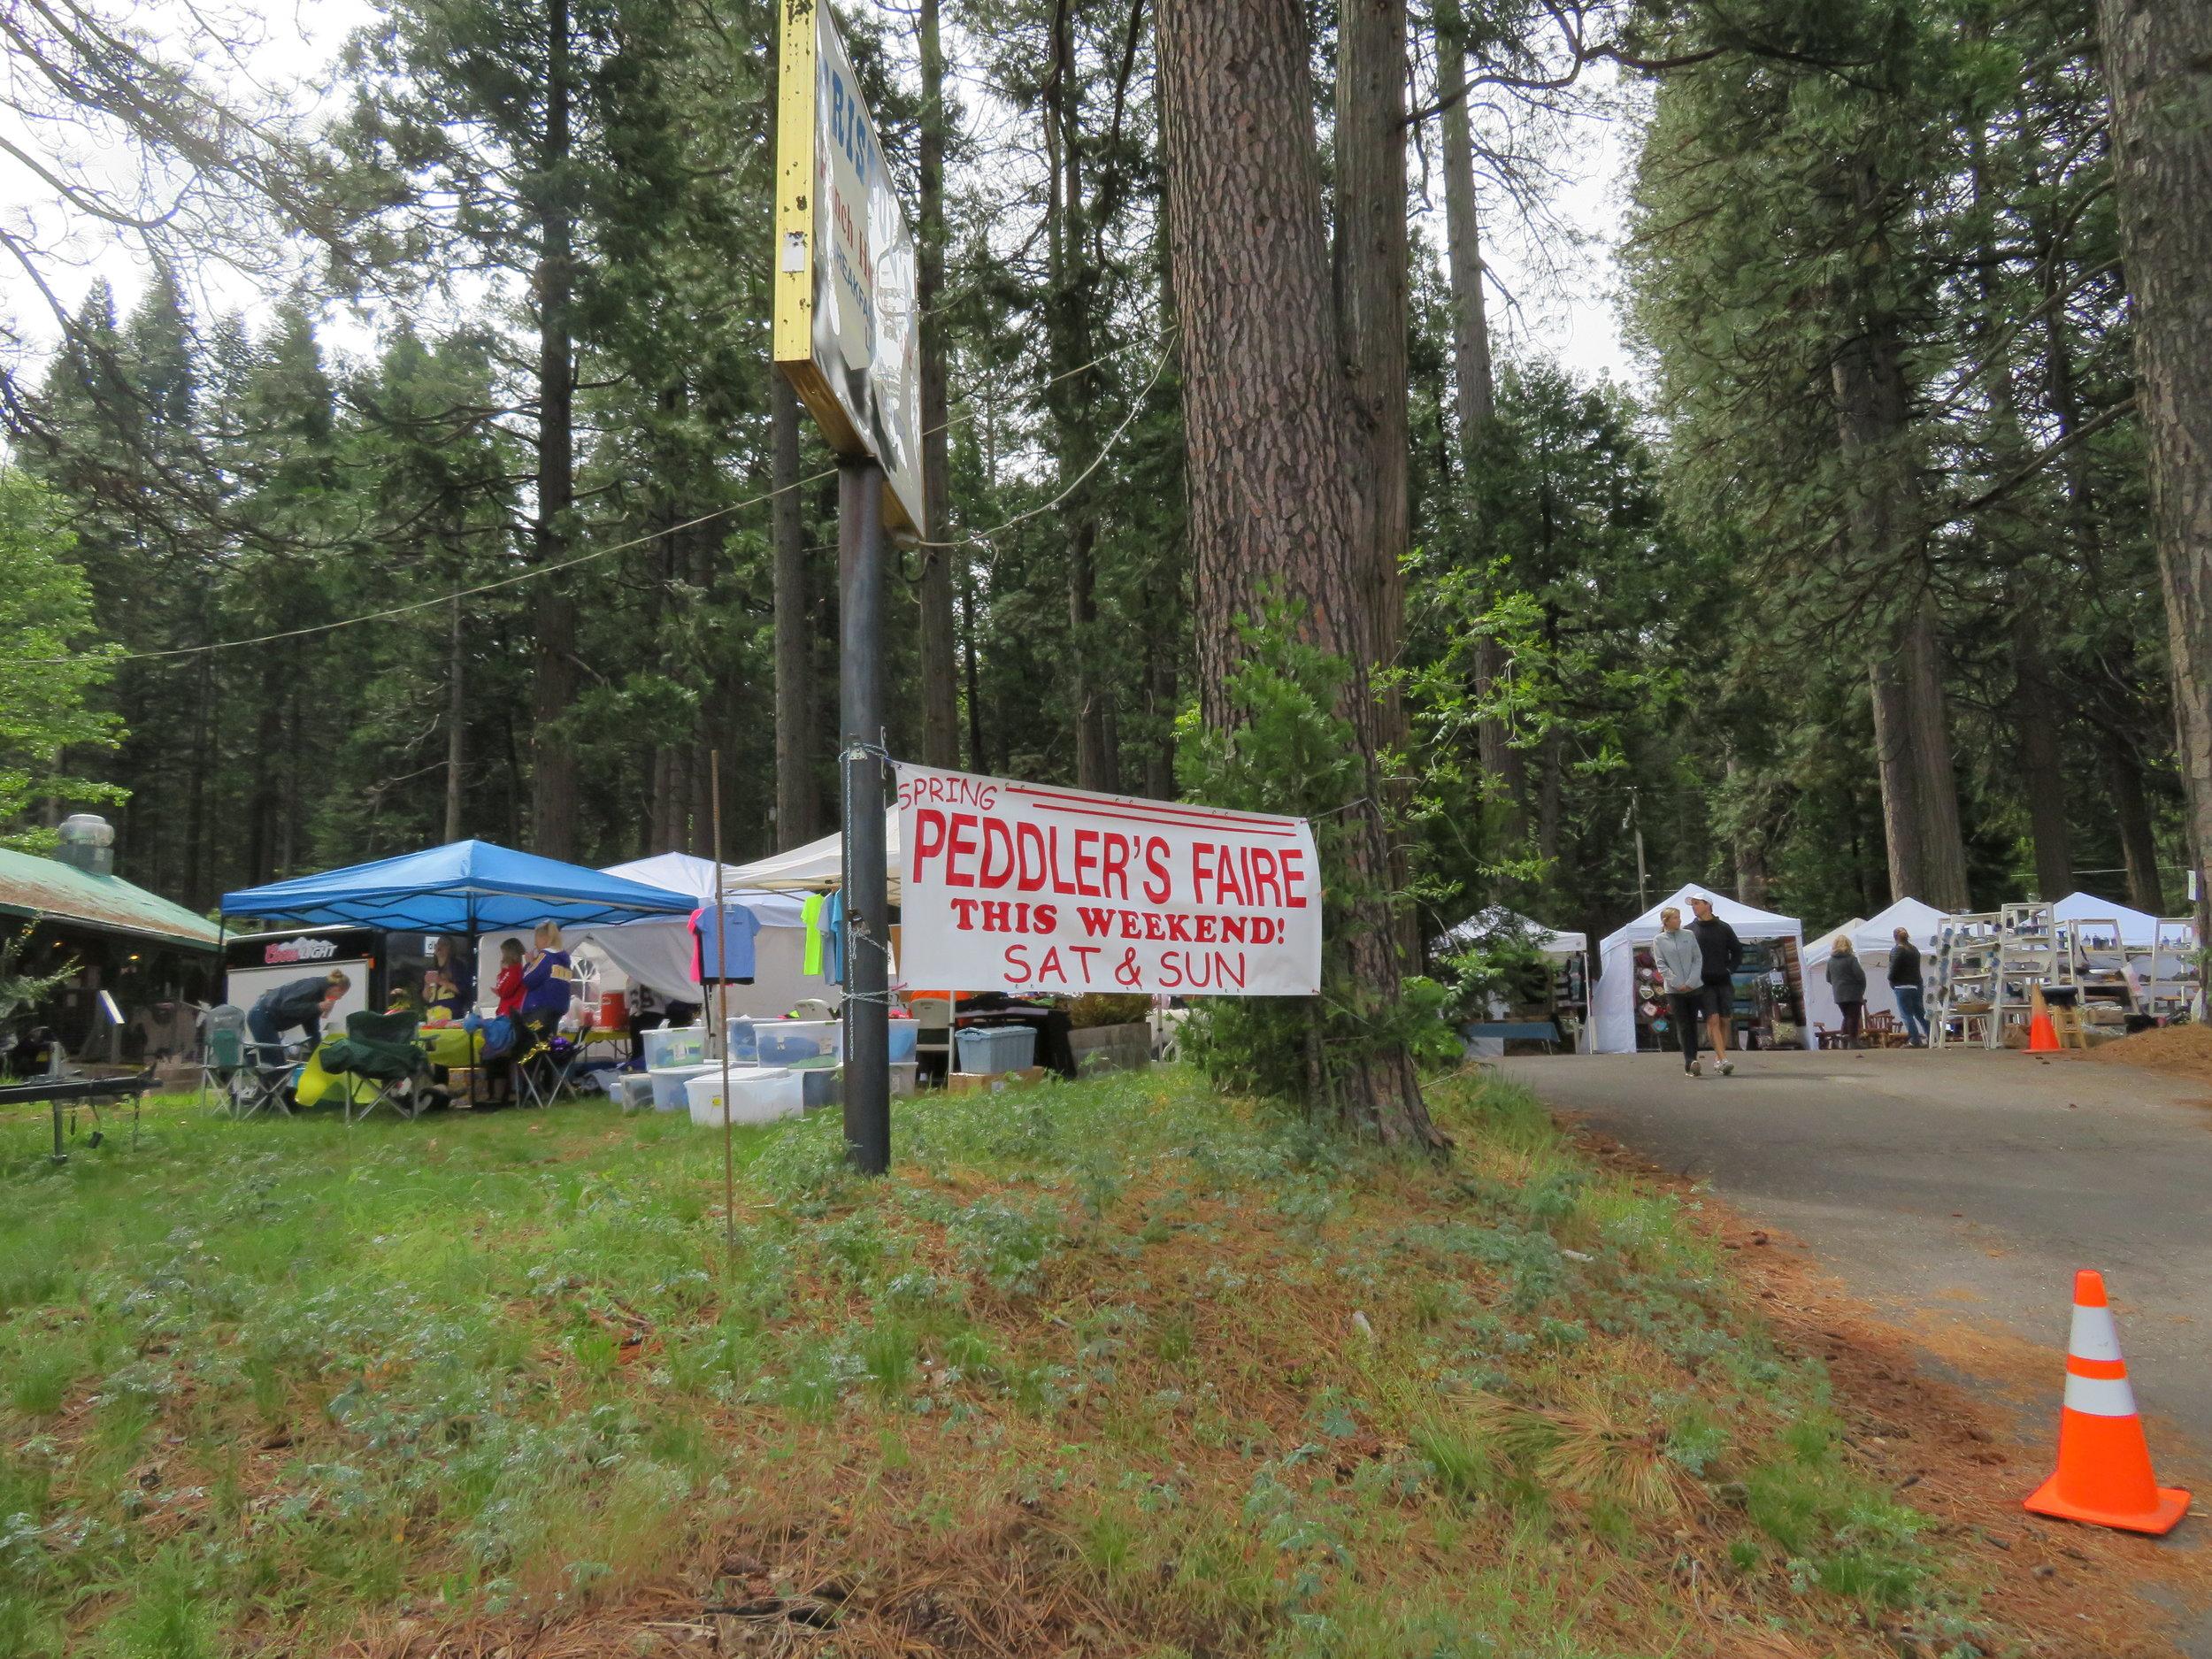 Arnold's 40th Annual Peddler's Faire